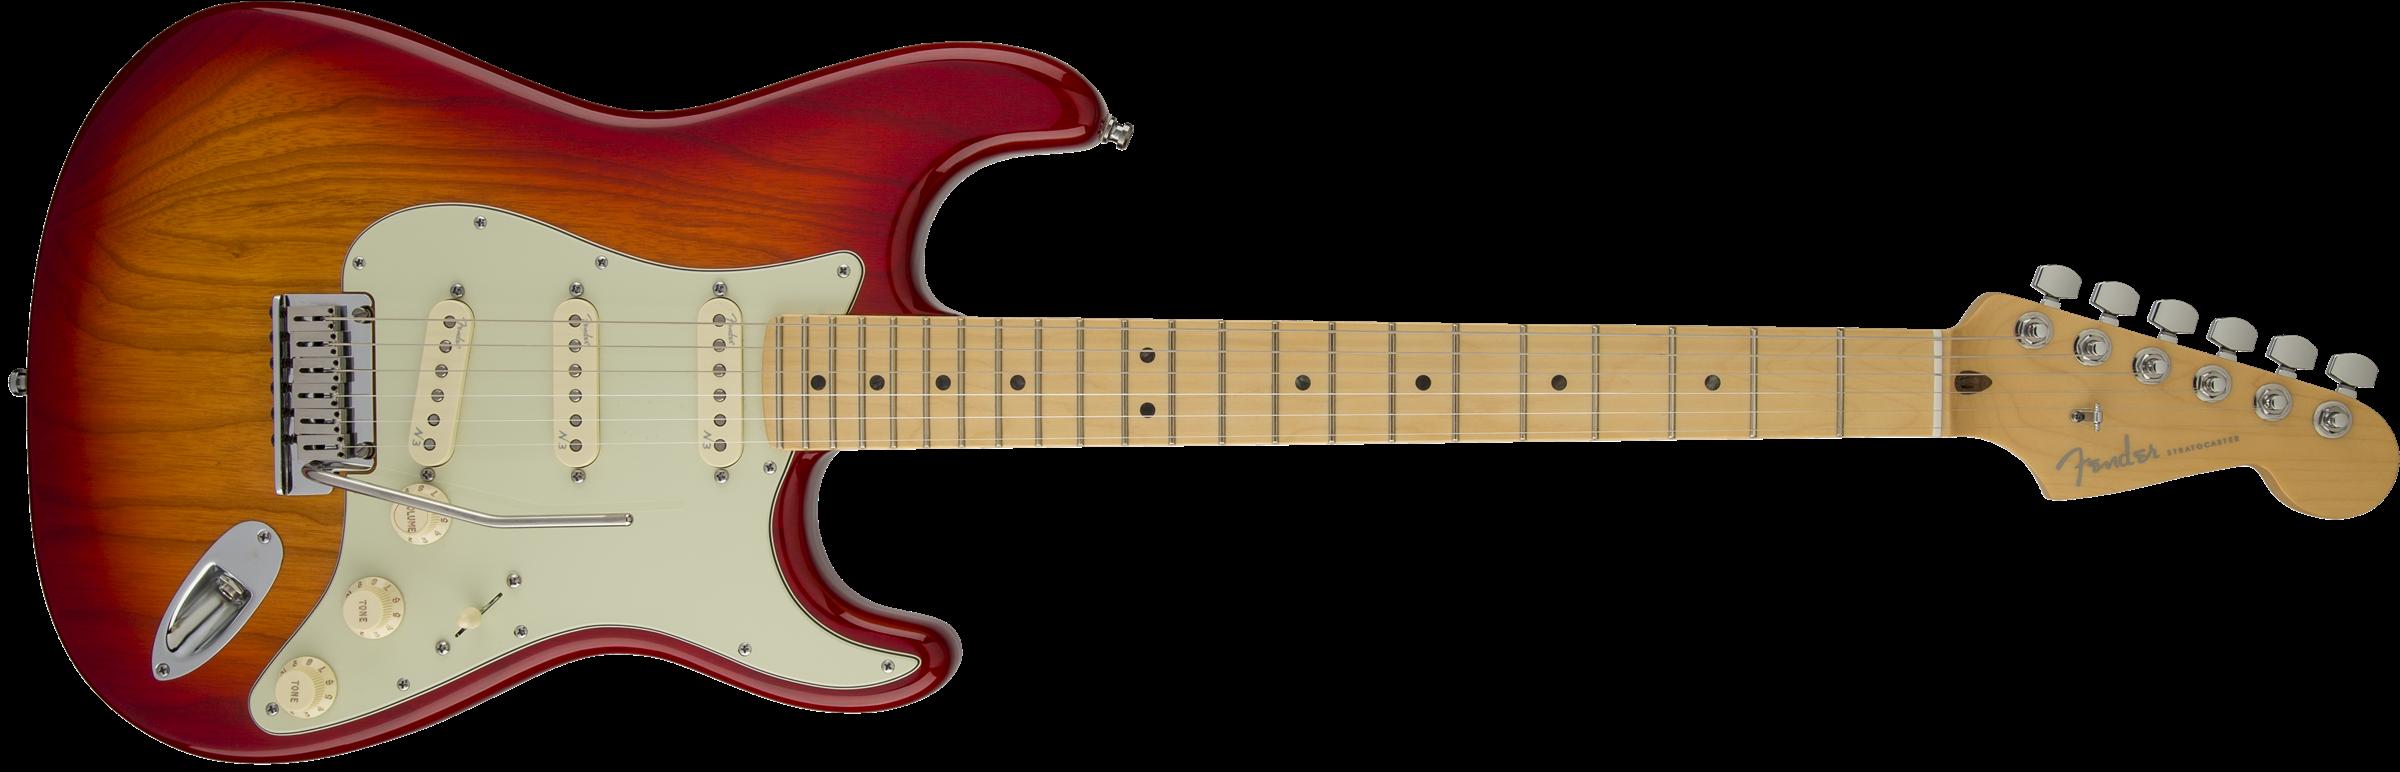 American Deluxe Stratocaster Ash Fender Electric Guitars Fender Electric Guitar Fender American Deluxe Fender Guitars Stratocaster